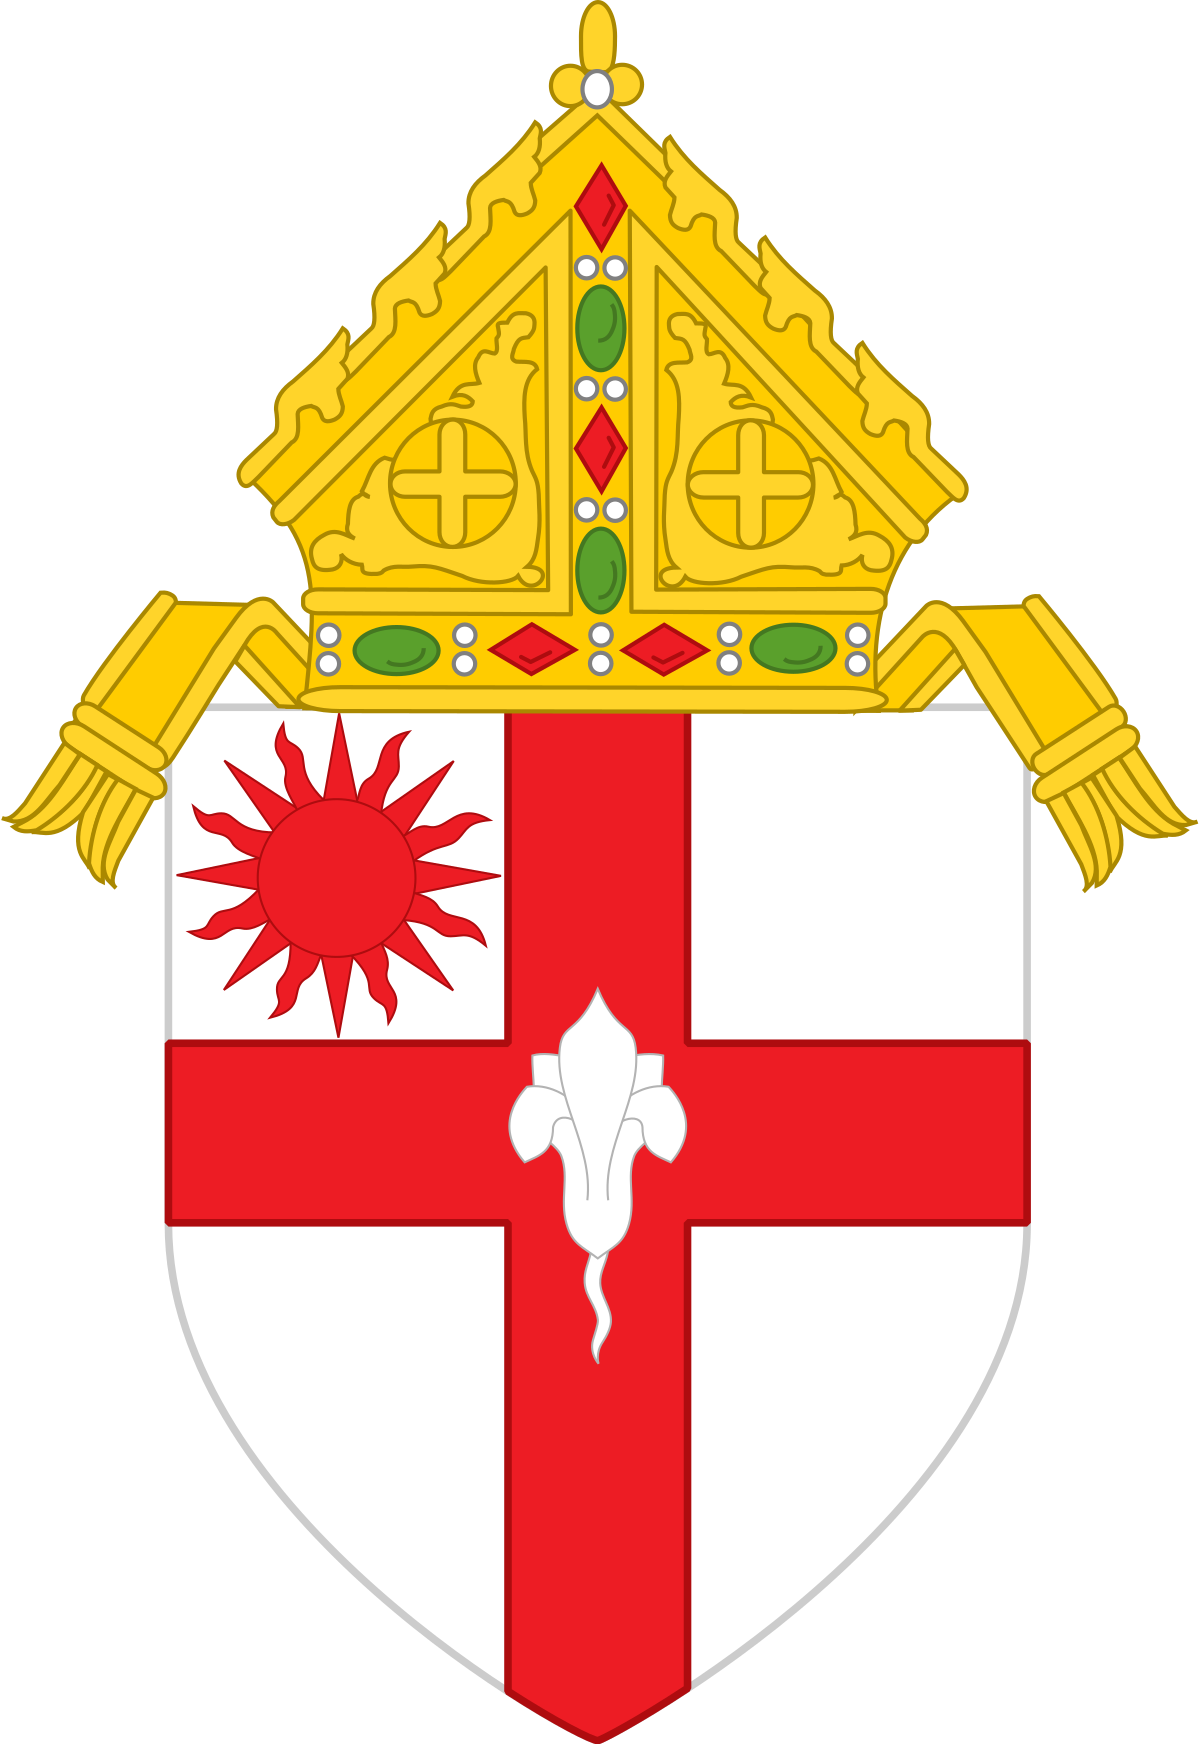 Roman Catholic Diocese of Spokane.